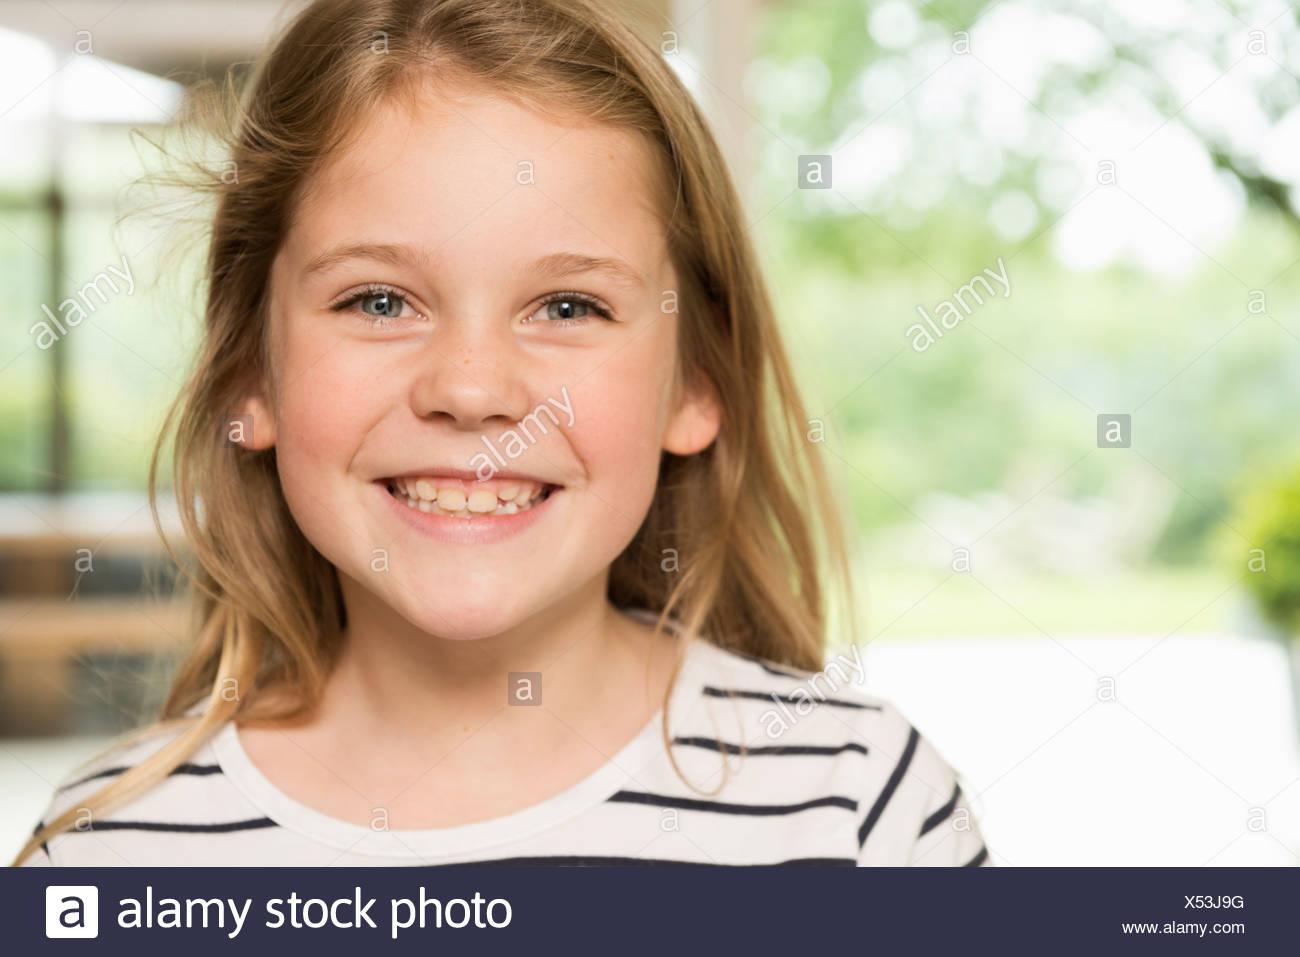 Chica con amplia sonrisa Imagen De Stock